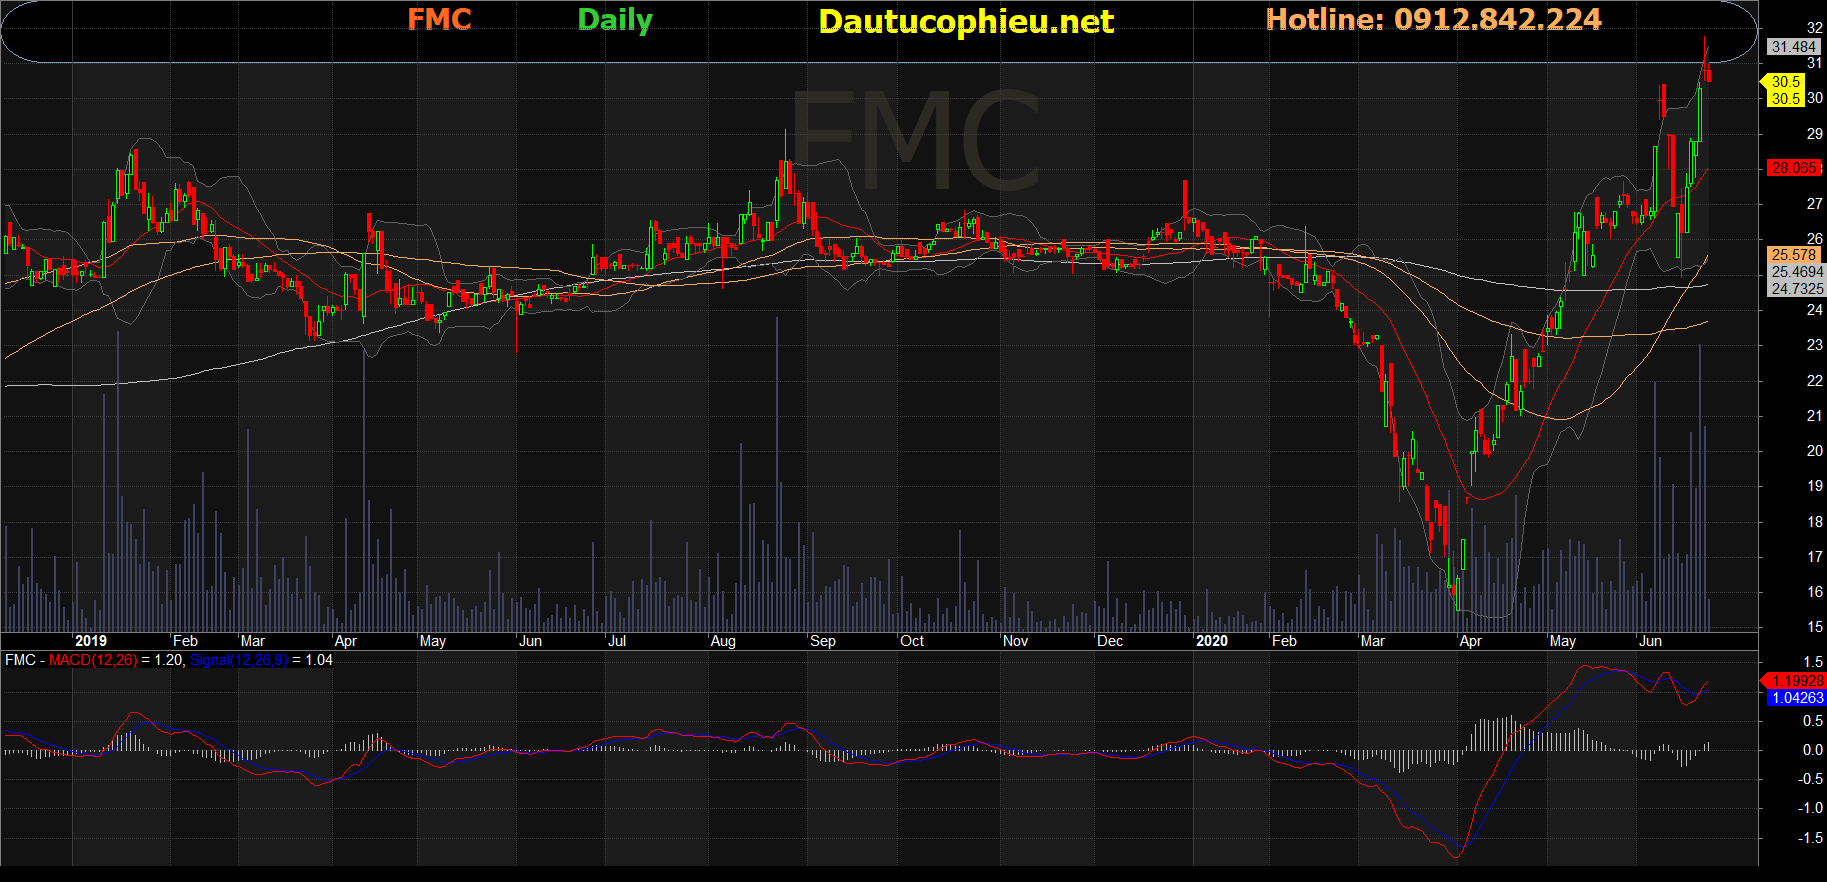 Cổ phiếu FMC